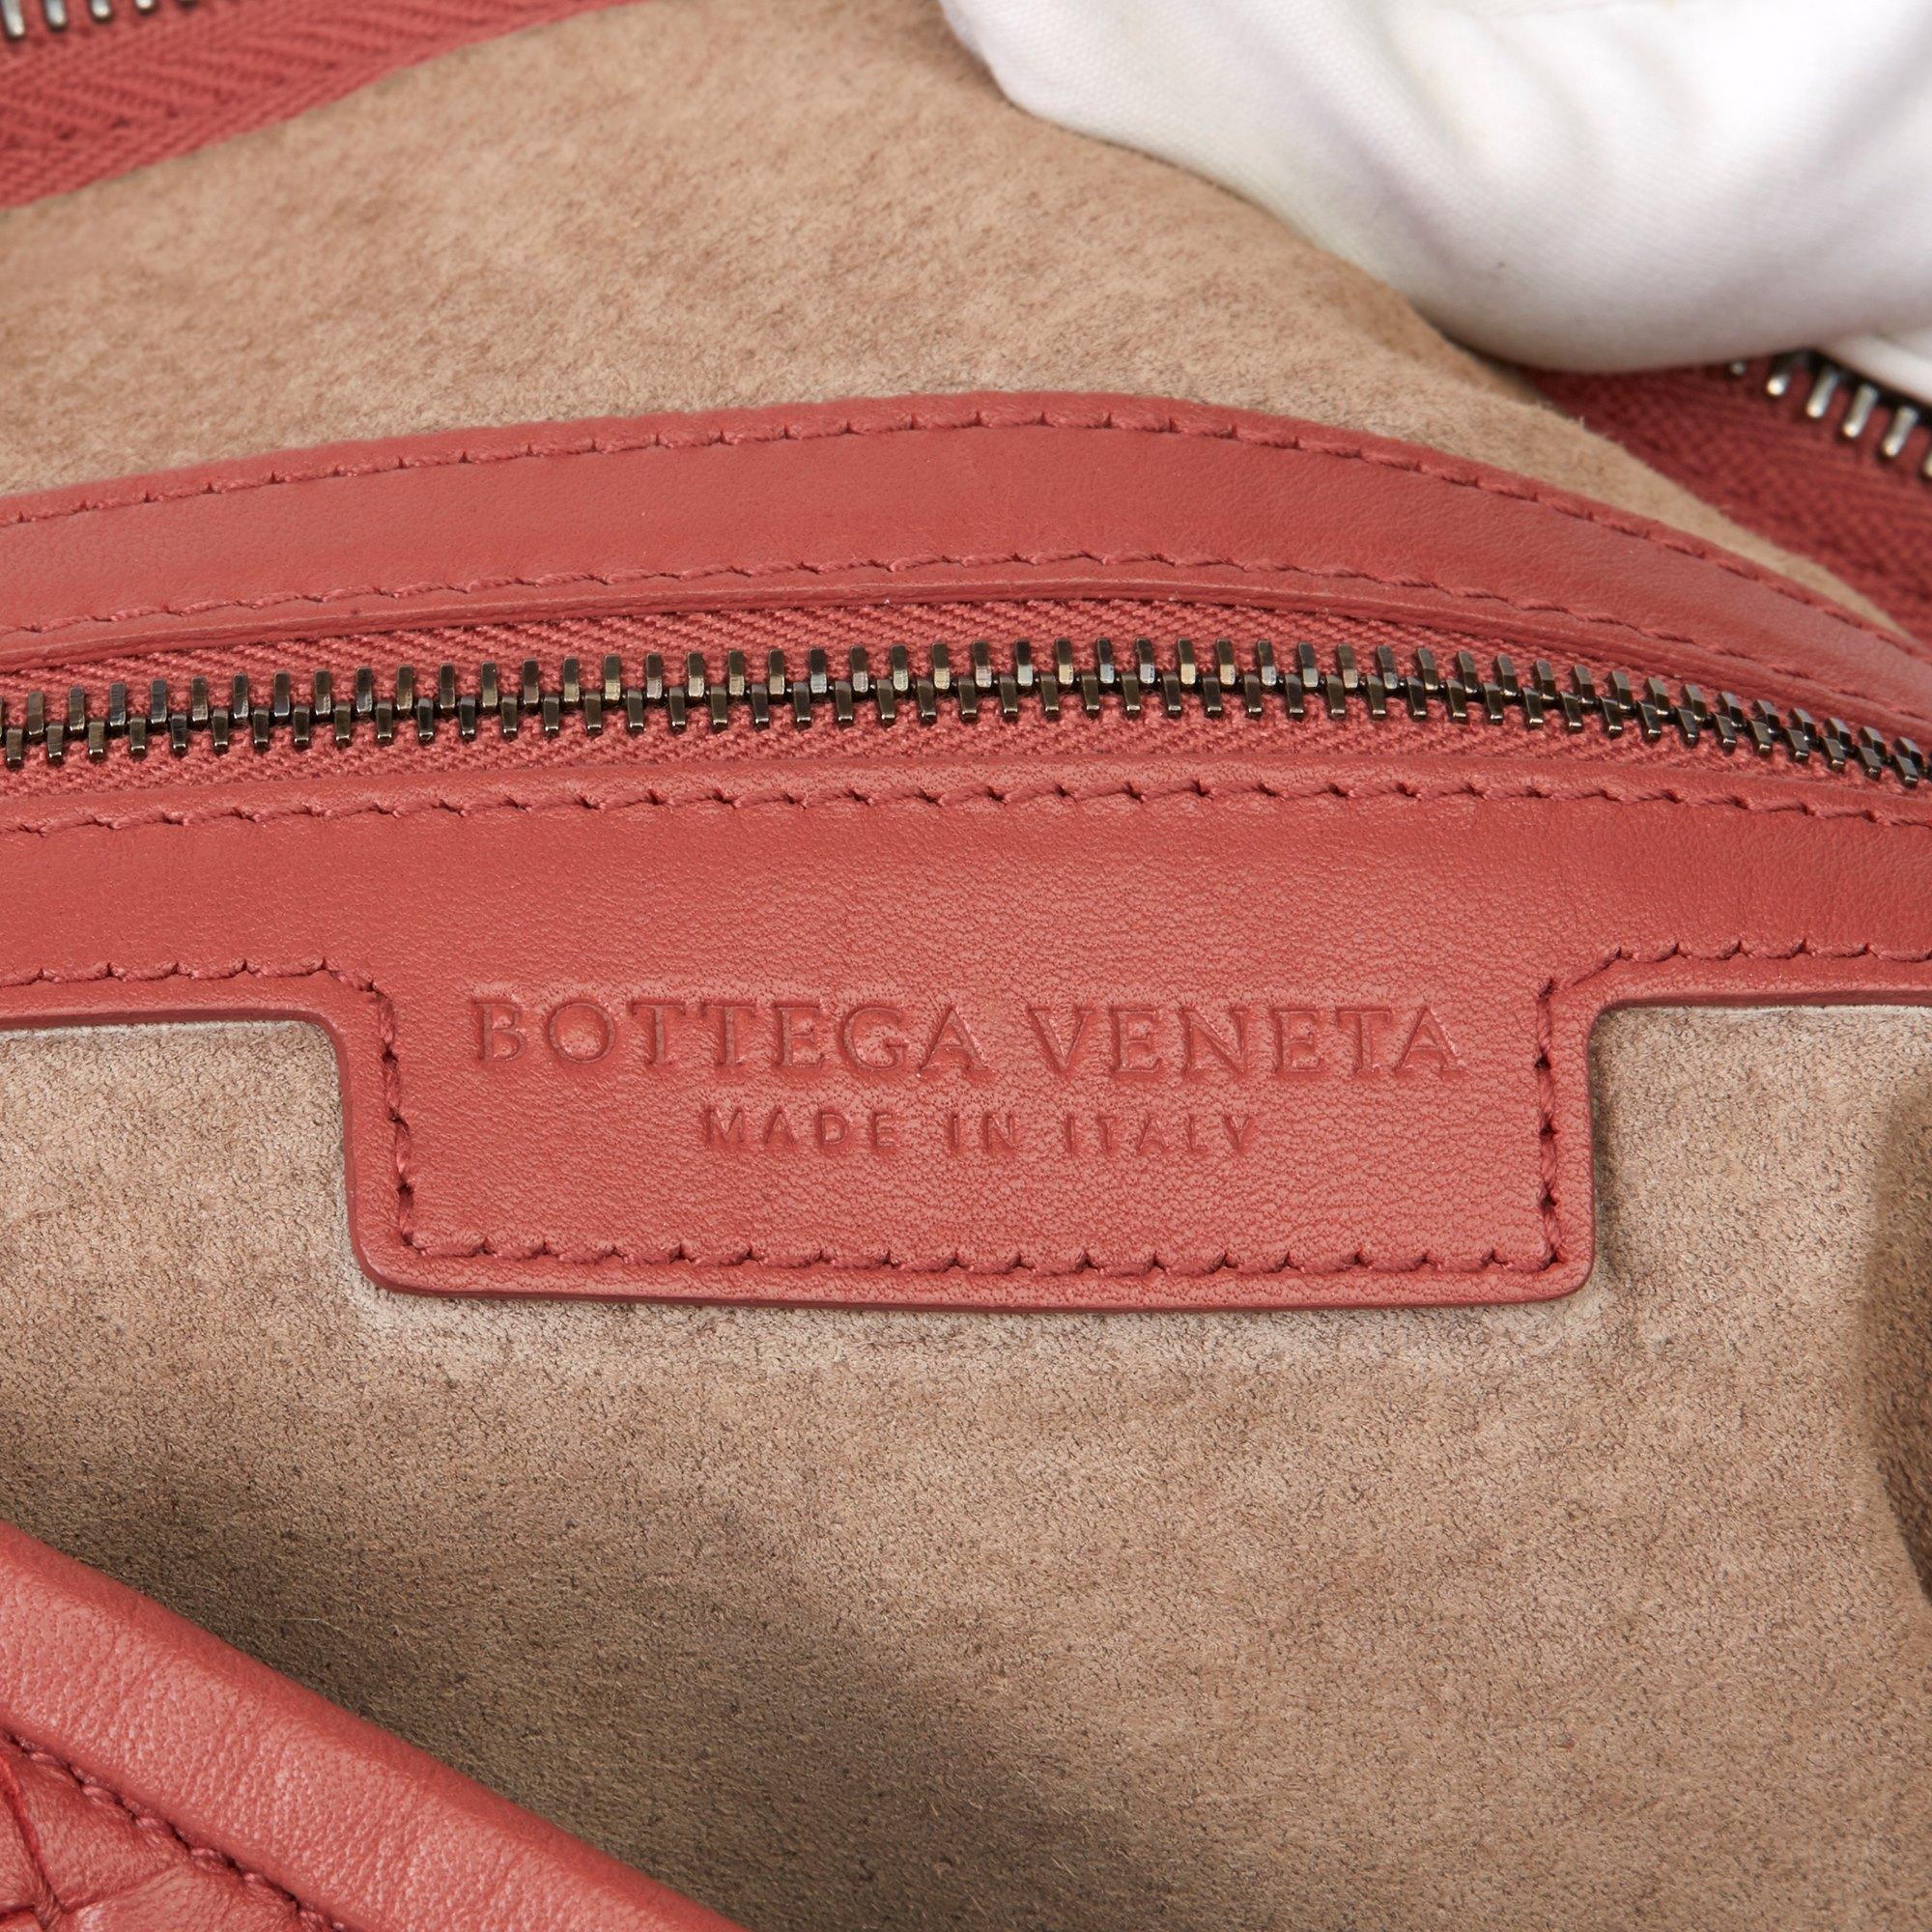 Bottega Veneta Burnt Red Woven Lambskin Medium Veneta Bag